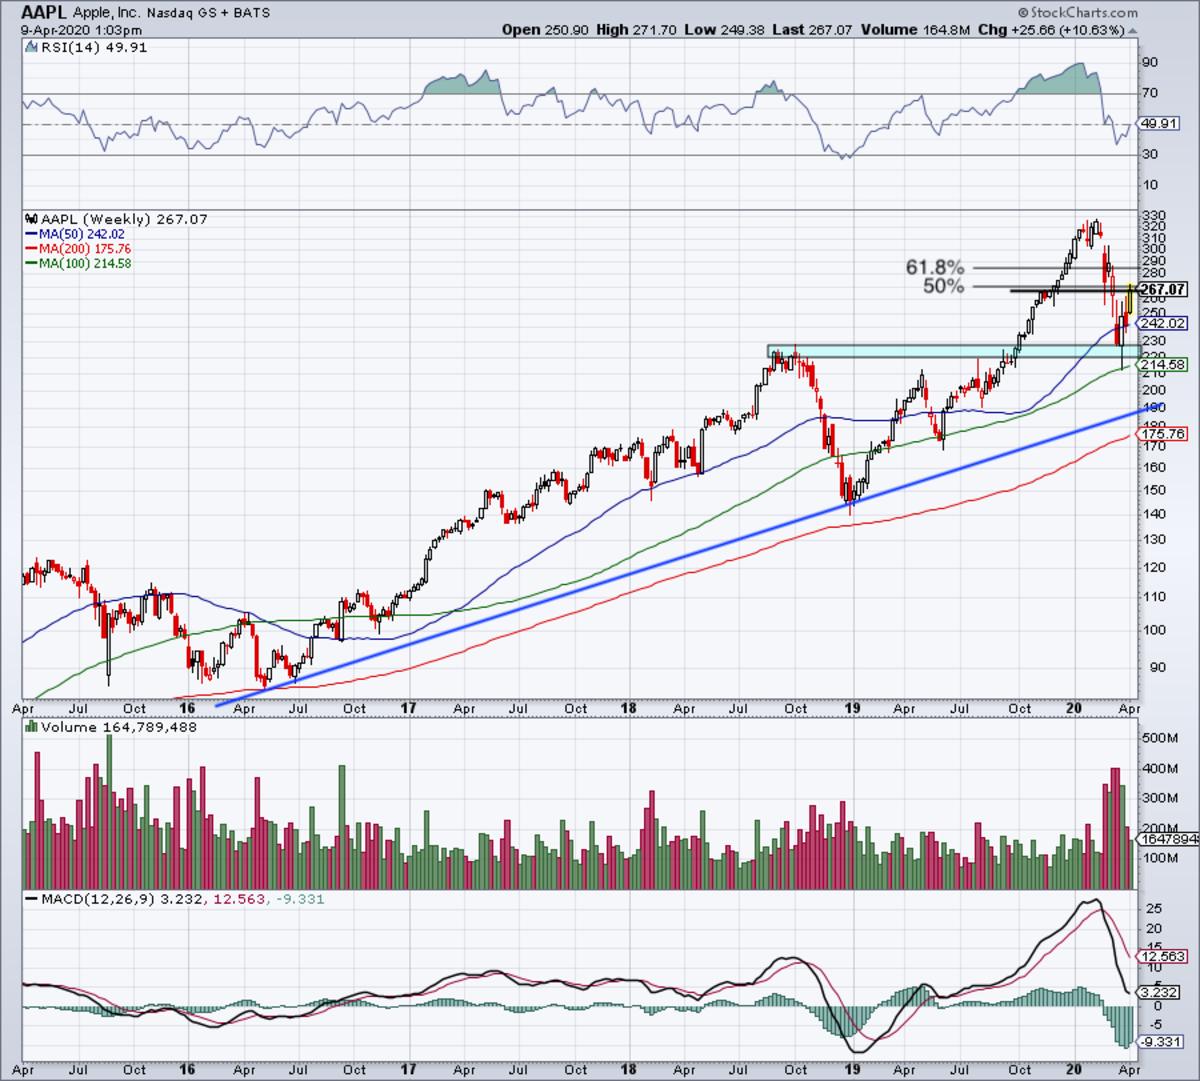 Weekly chart of Apple stock.